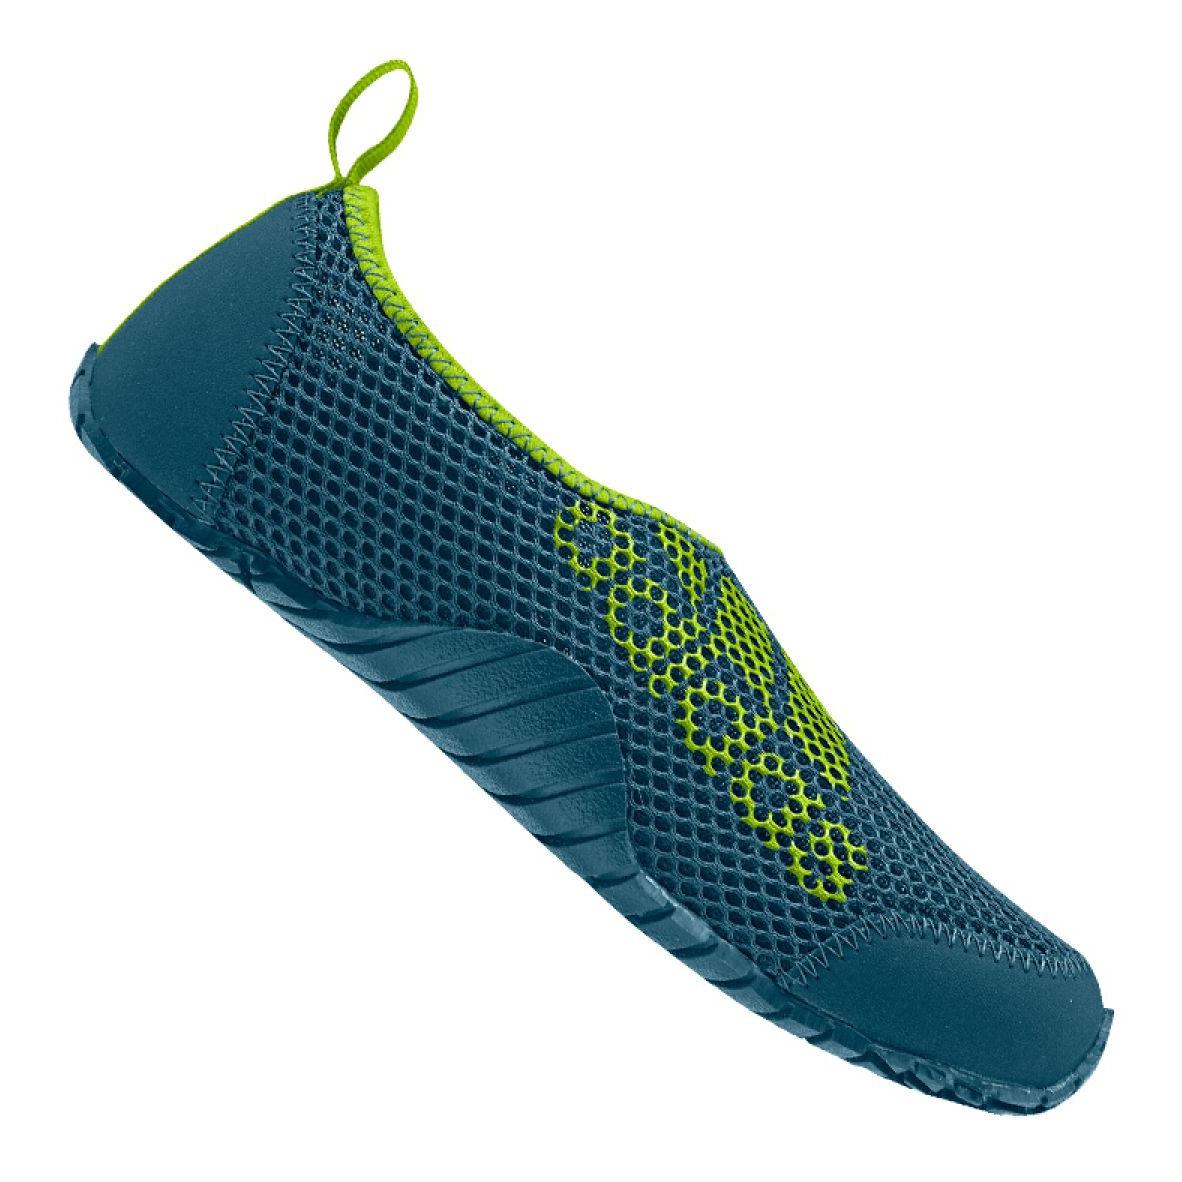 Adidas Kurobe K Jr CM7644 water shoes green blue